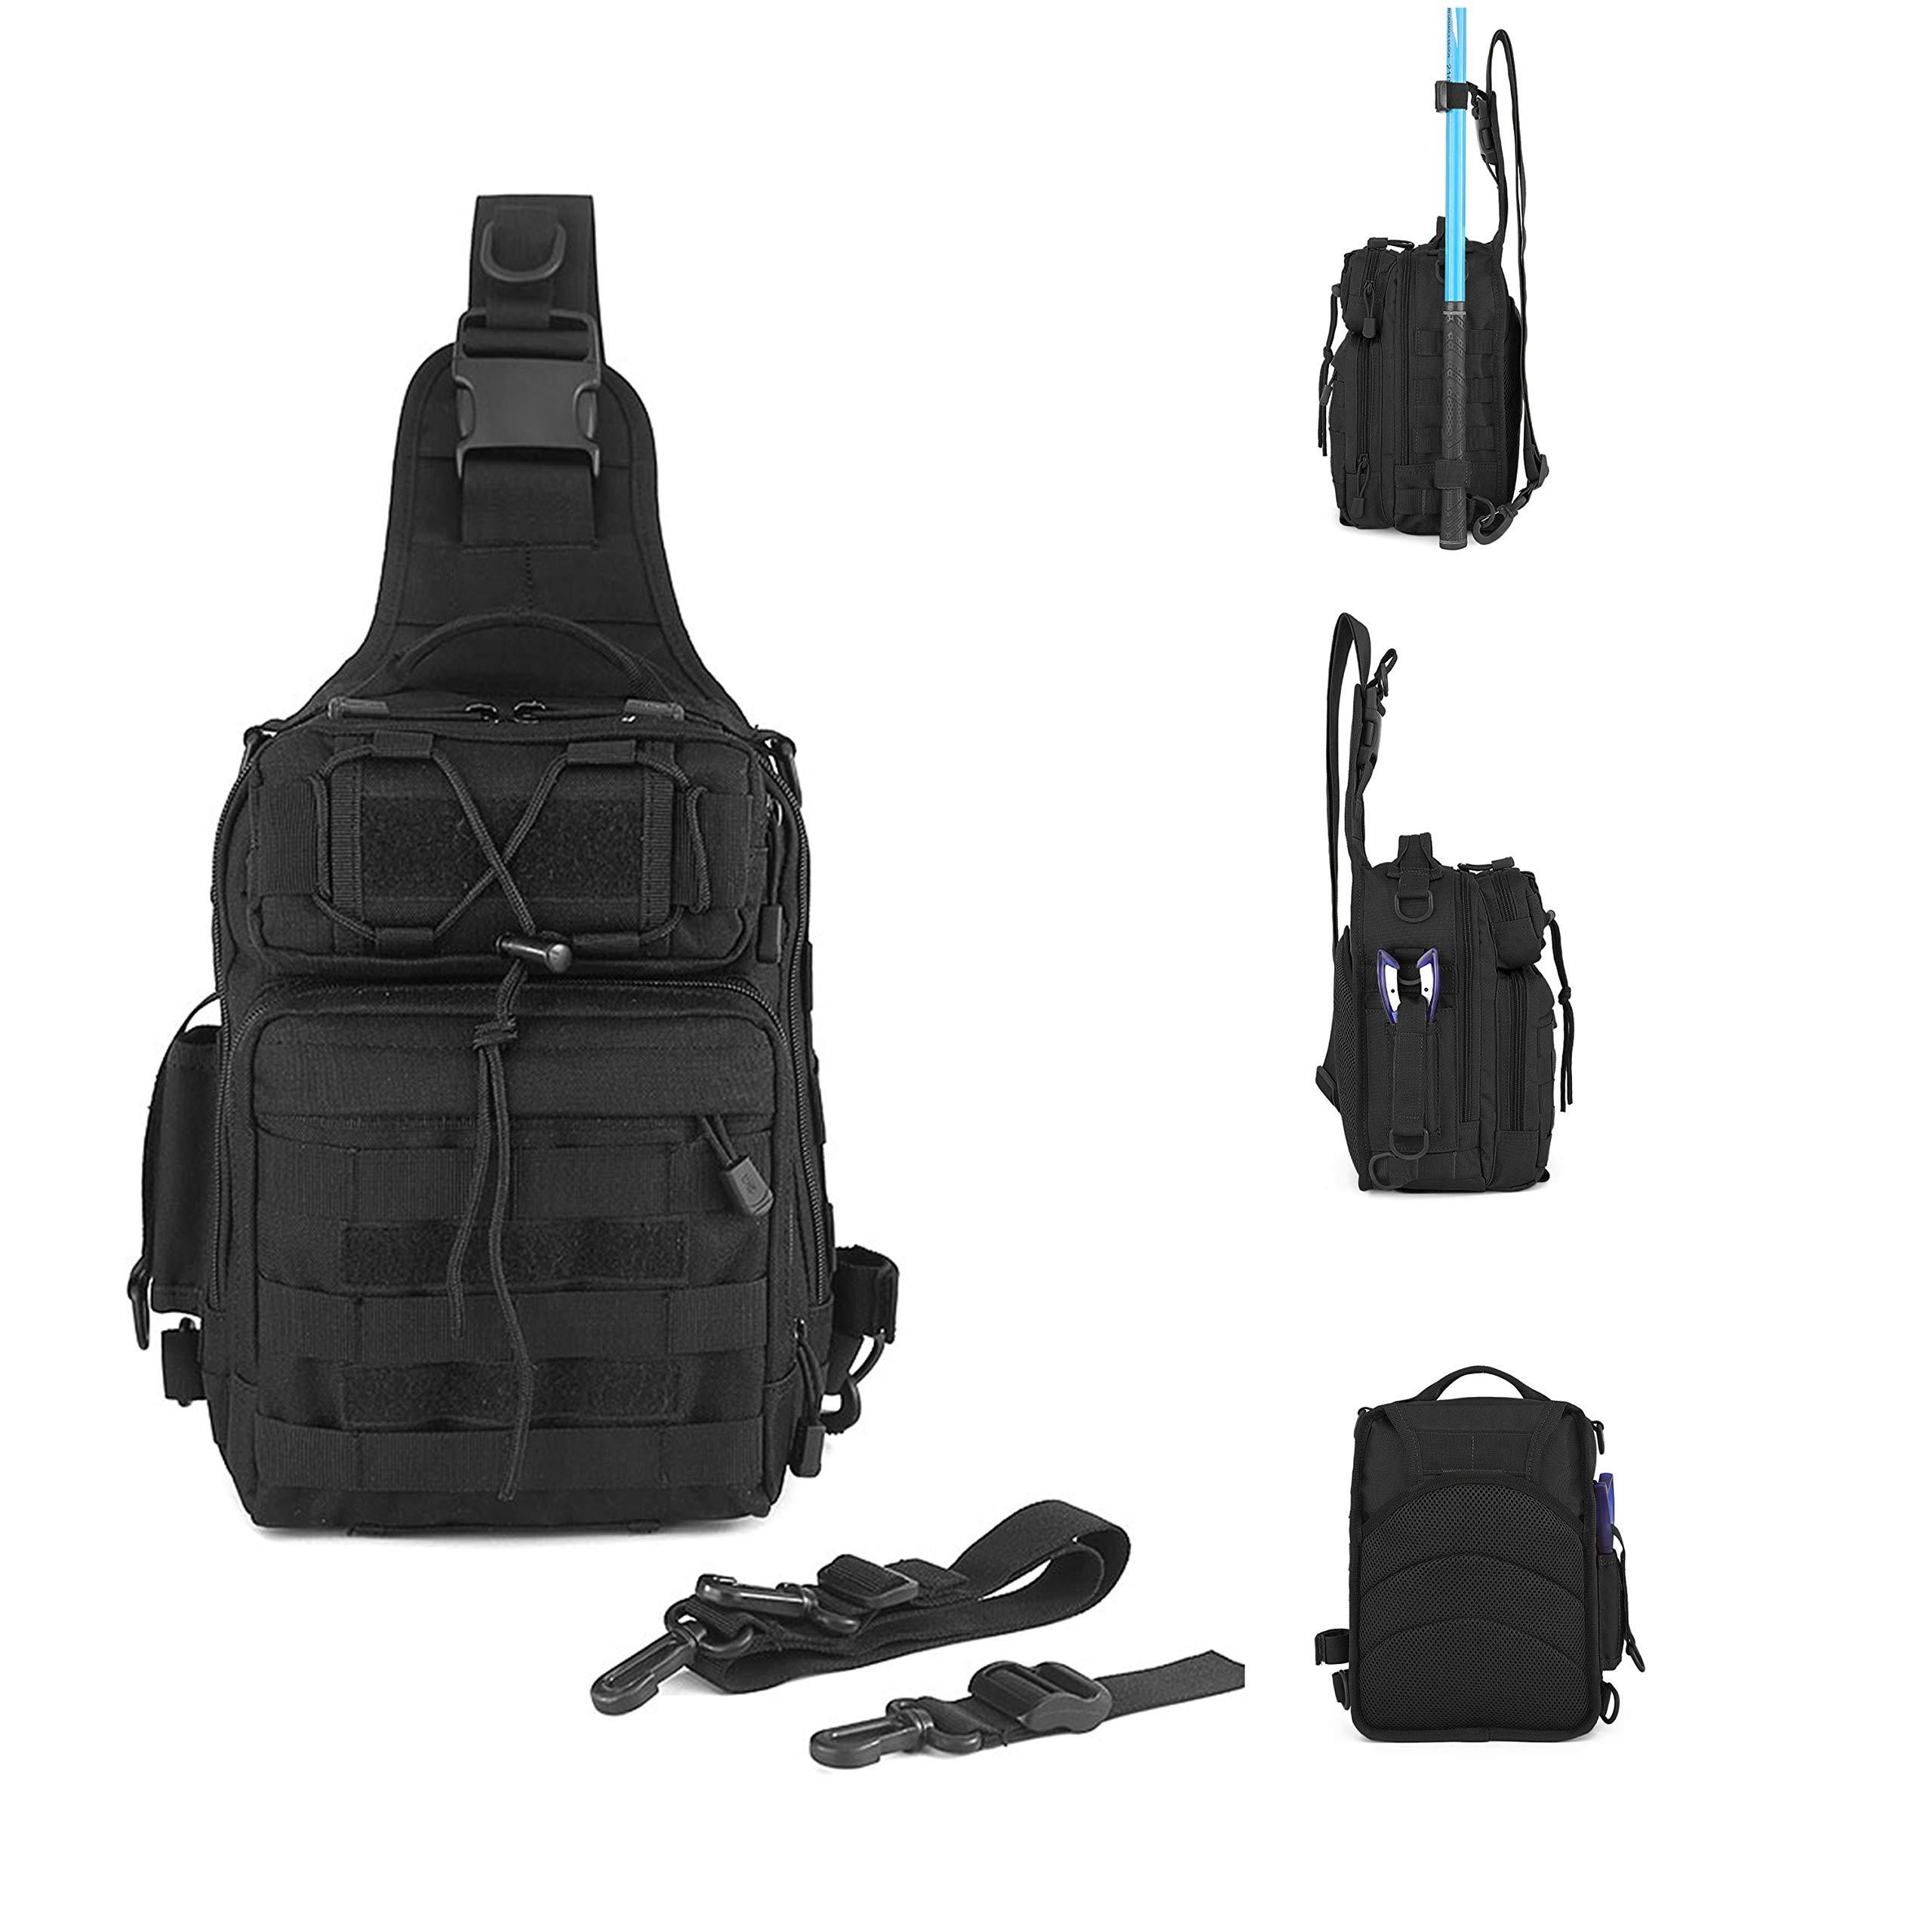 Huntvp Single Shoulder Fishing Tackle Bag Backpack Water-Resistant Crossbody Fishing Backpack Fishing Gear Storage Bag Hunting Backpack